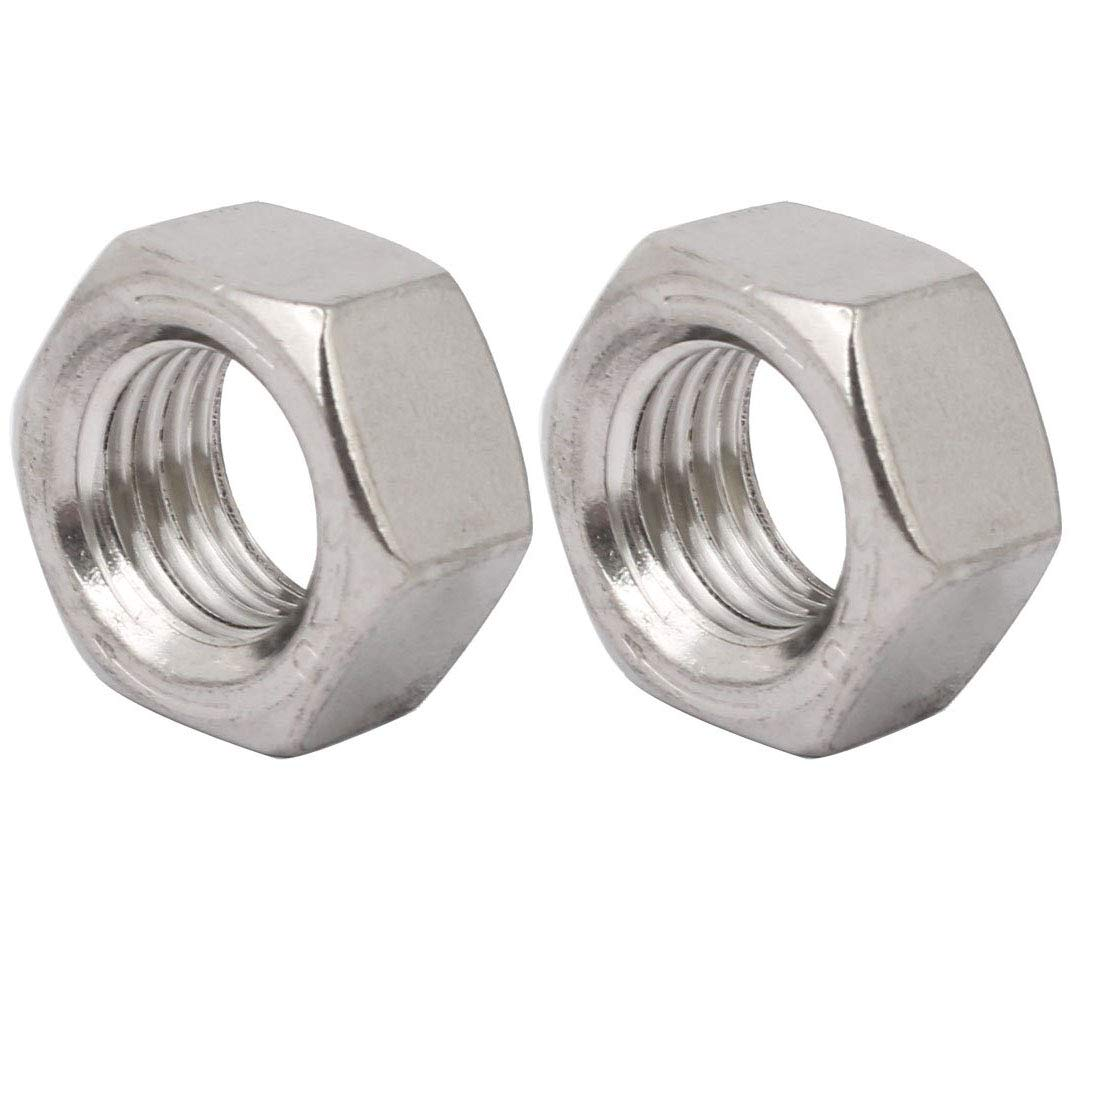 YXQ 1000Pcs M3 Hex Nuts 3mm Female Thread Metal Fastener Silver Tone